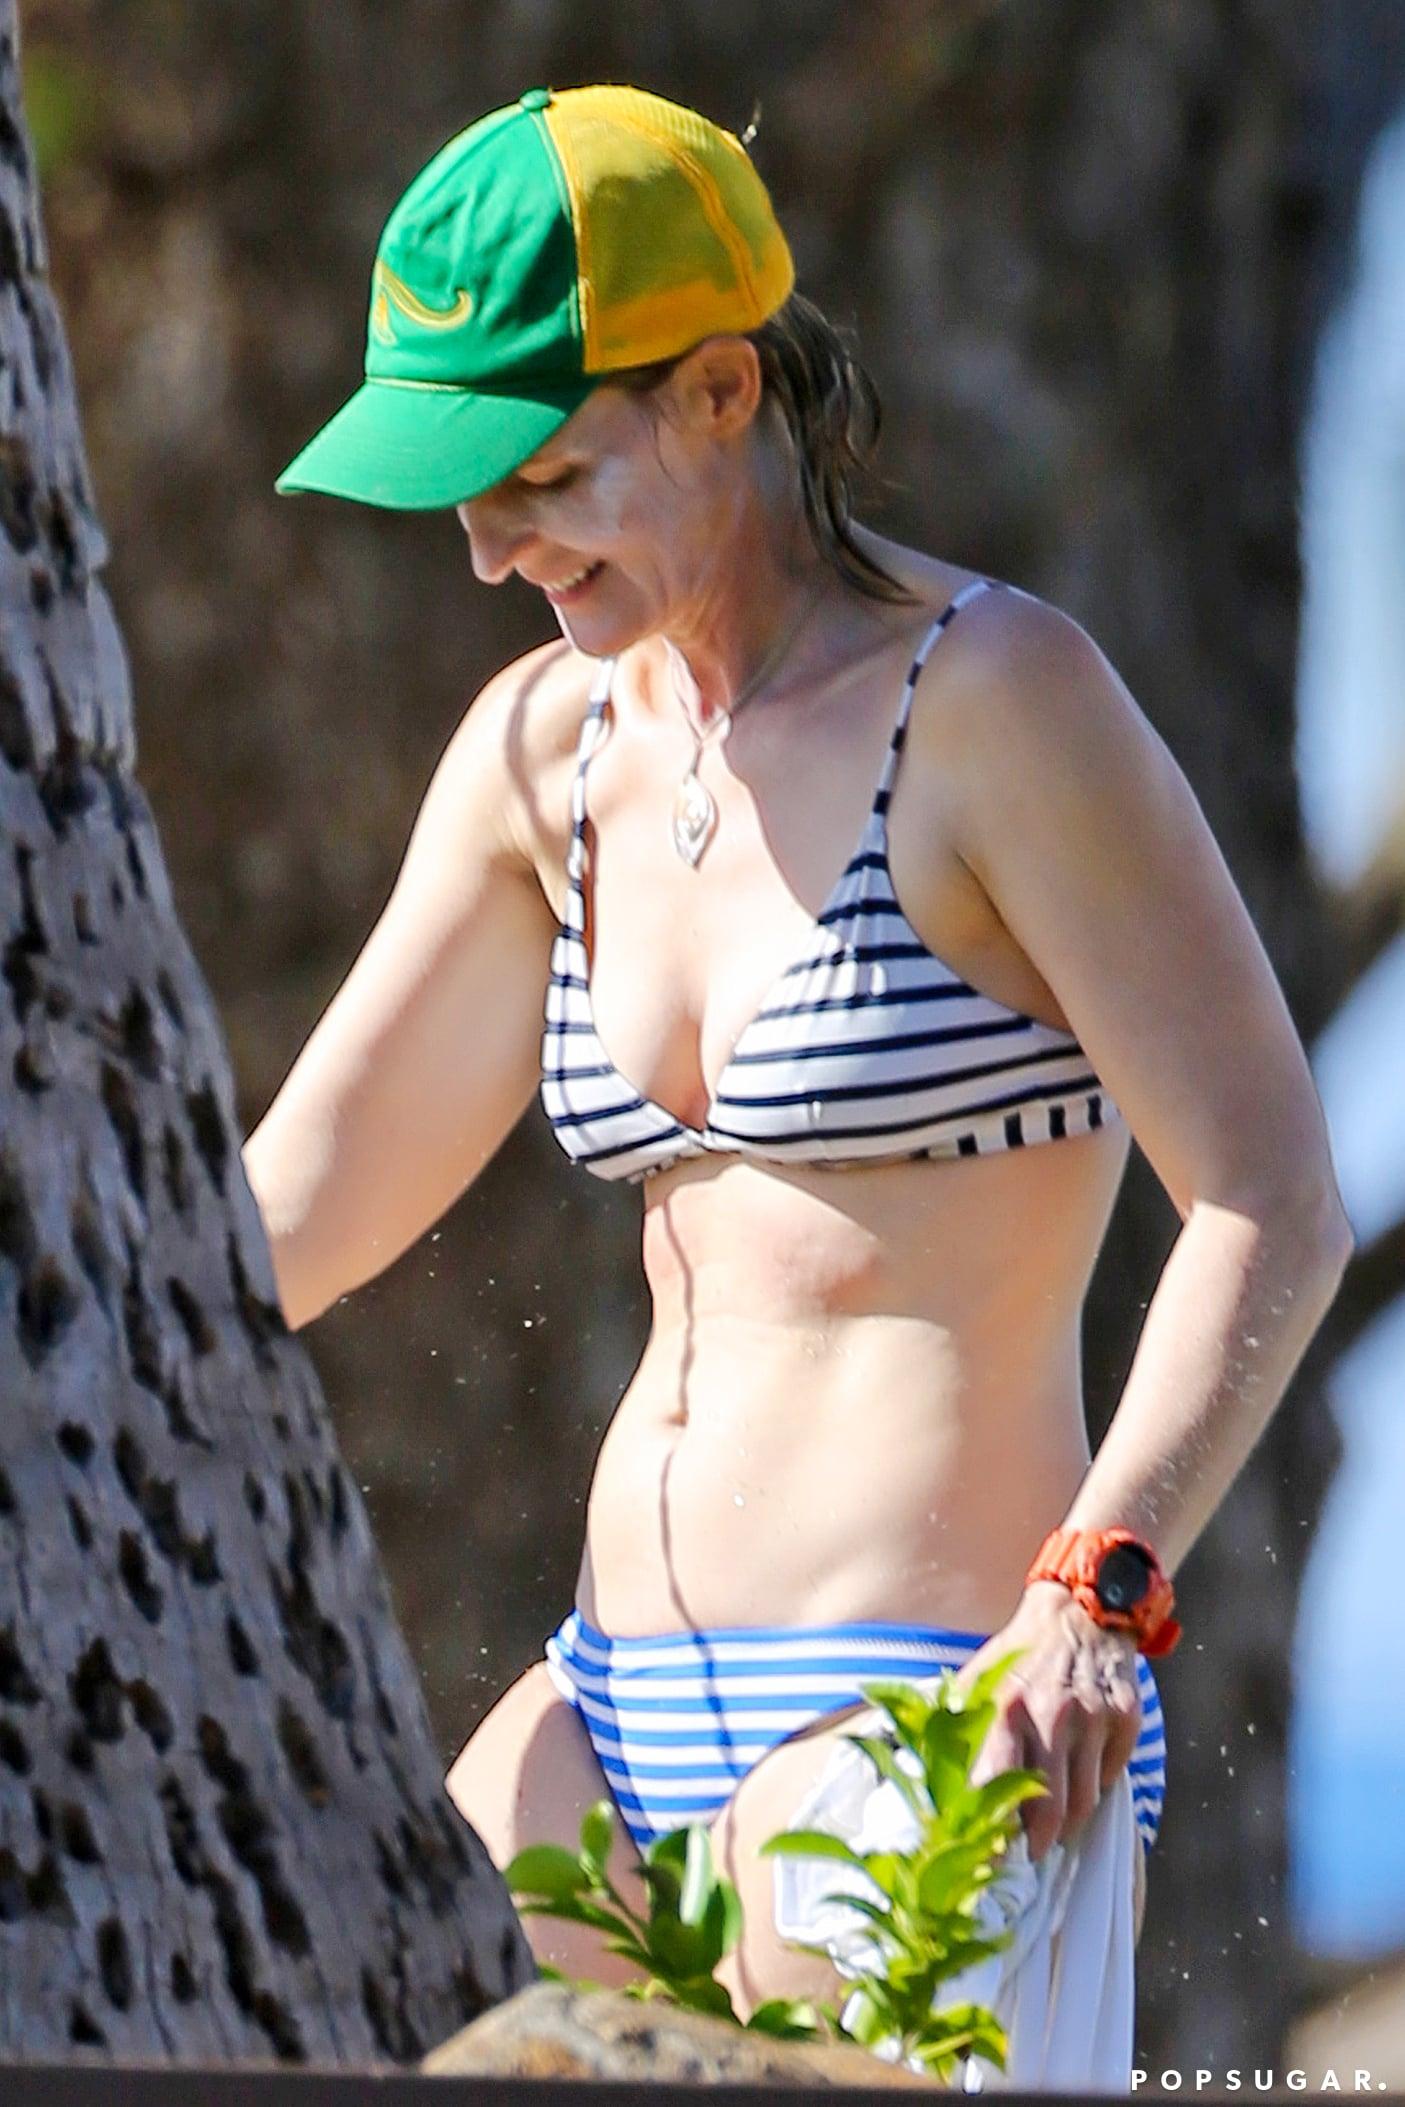 Helen Hunt's Bikini Body Will Make You Do a Double Take